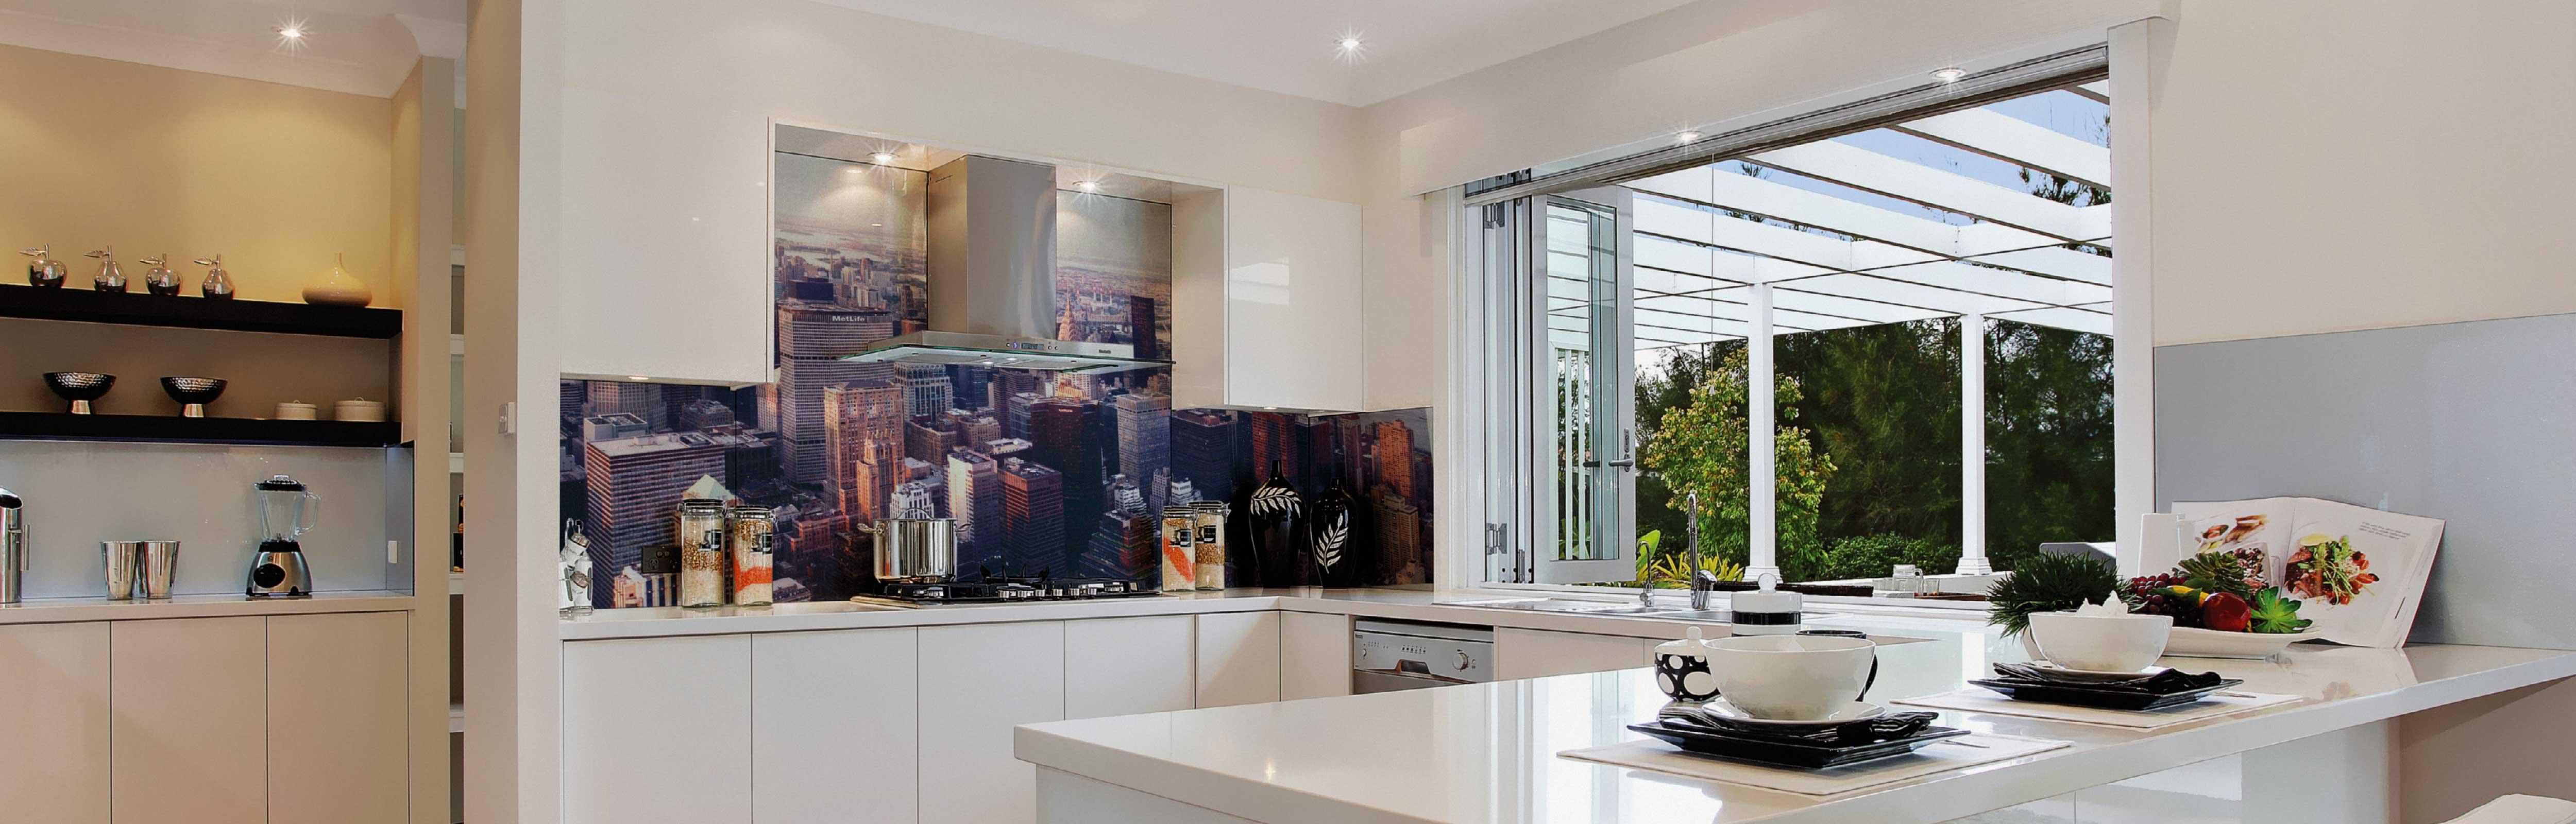 Image Glass Splashbacks above a kitchen bench